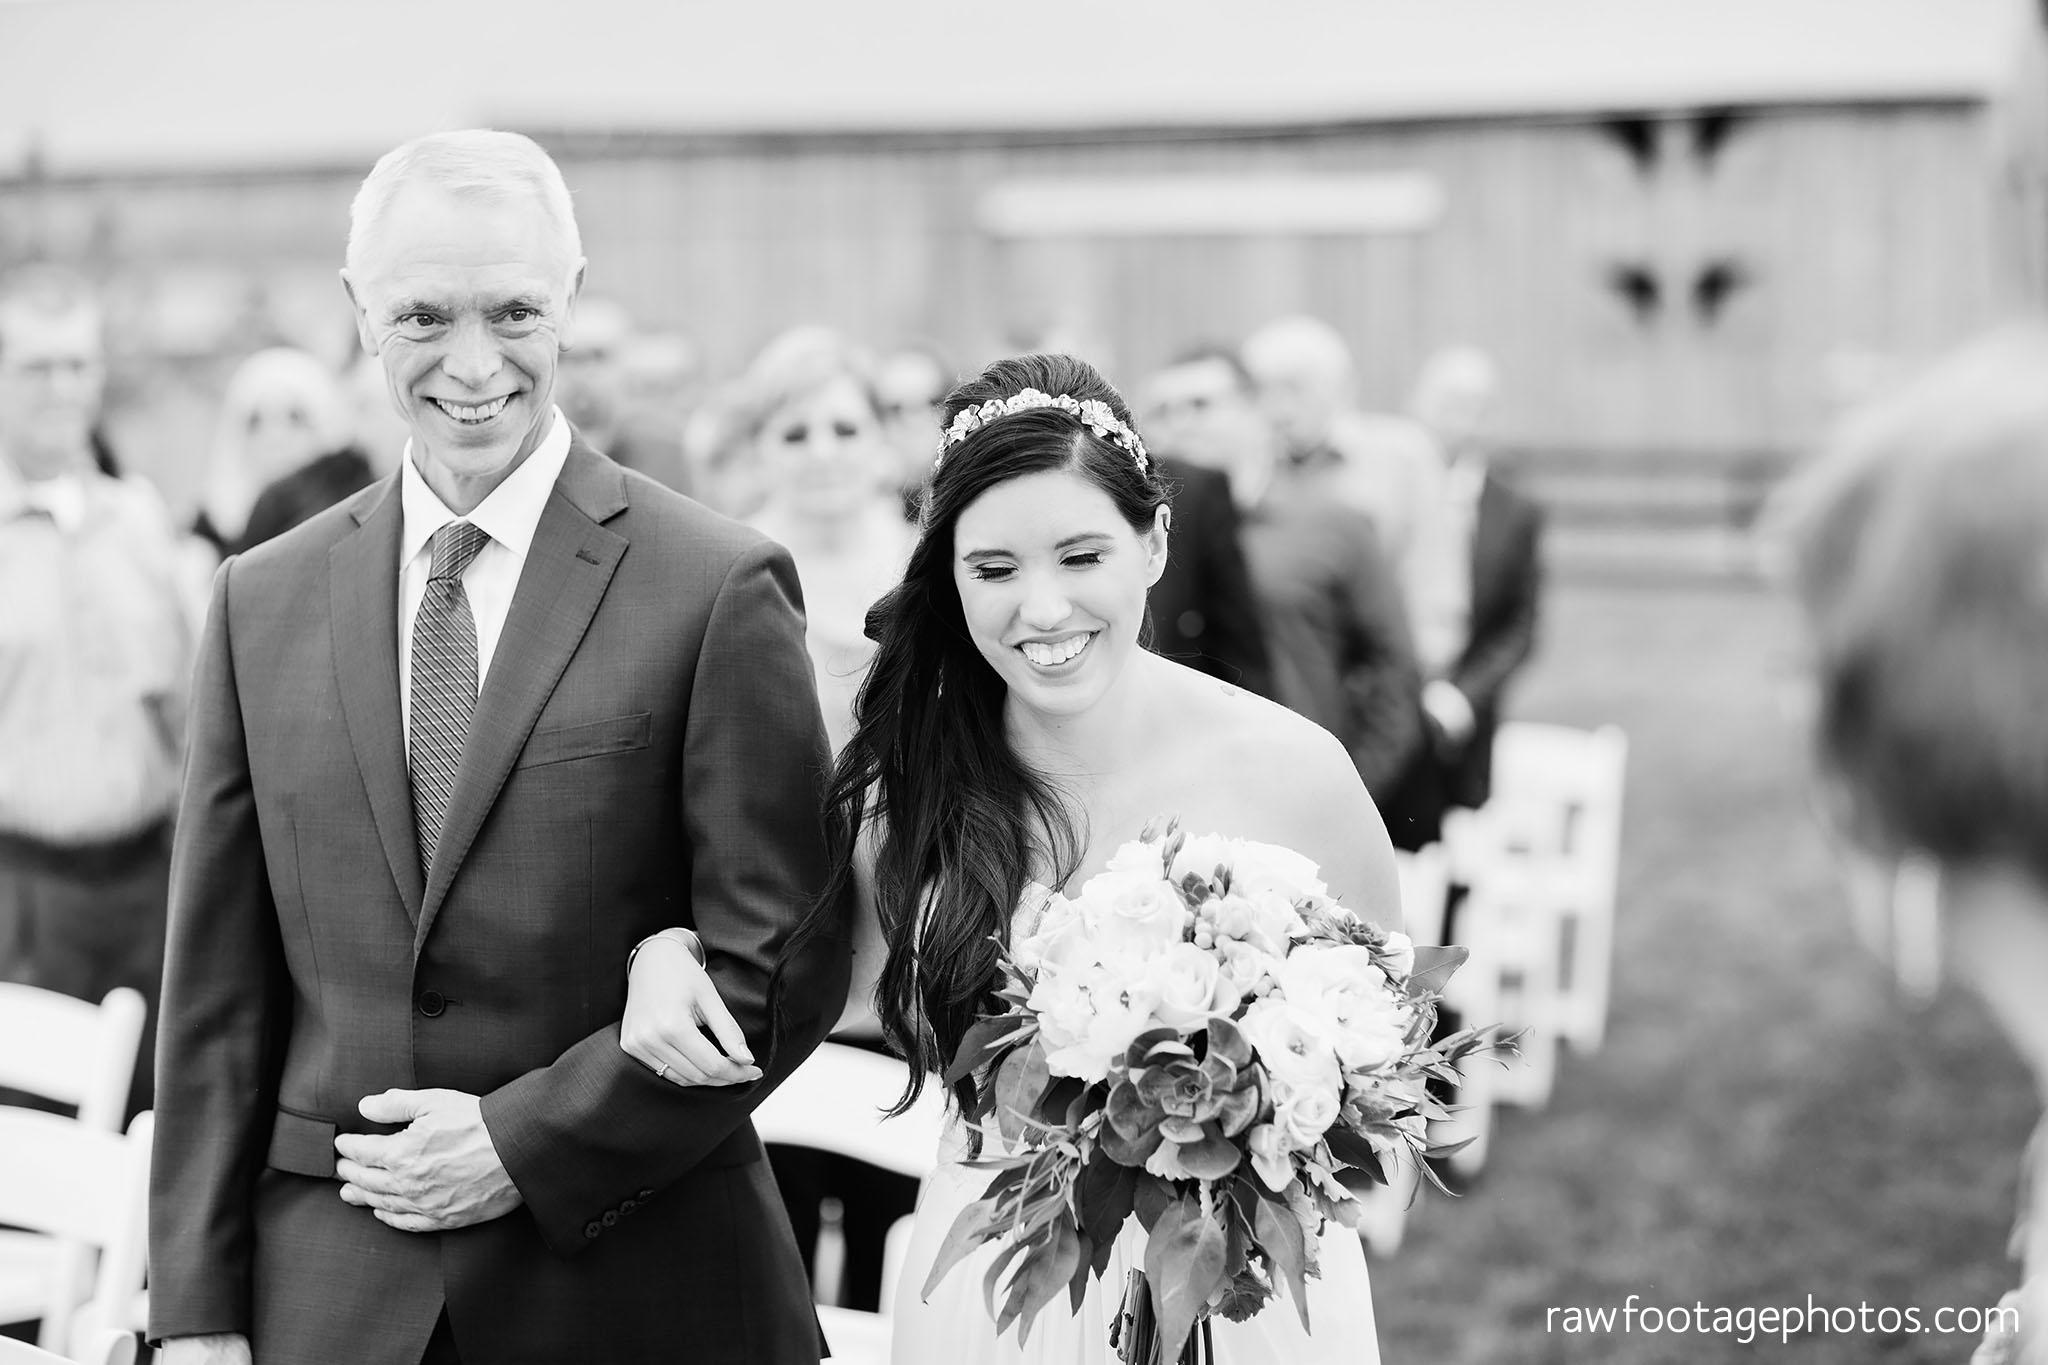 london_ontario_wedding_photographer-century_wedding_barn-raw_footage_photography-diy_wedding065.jpg